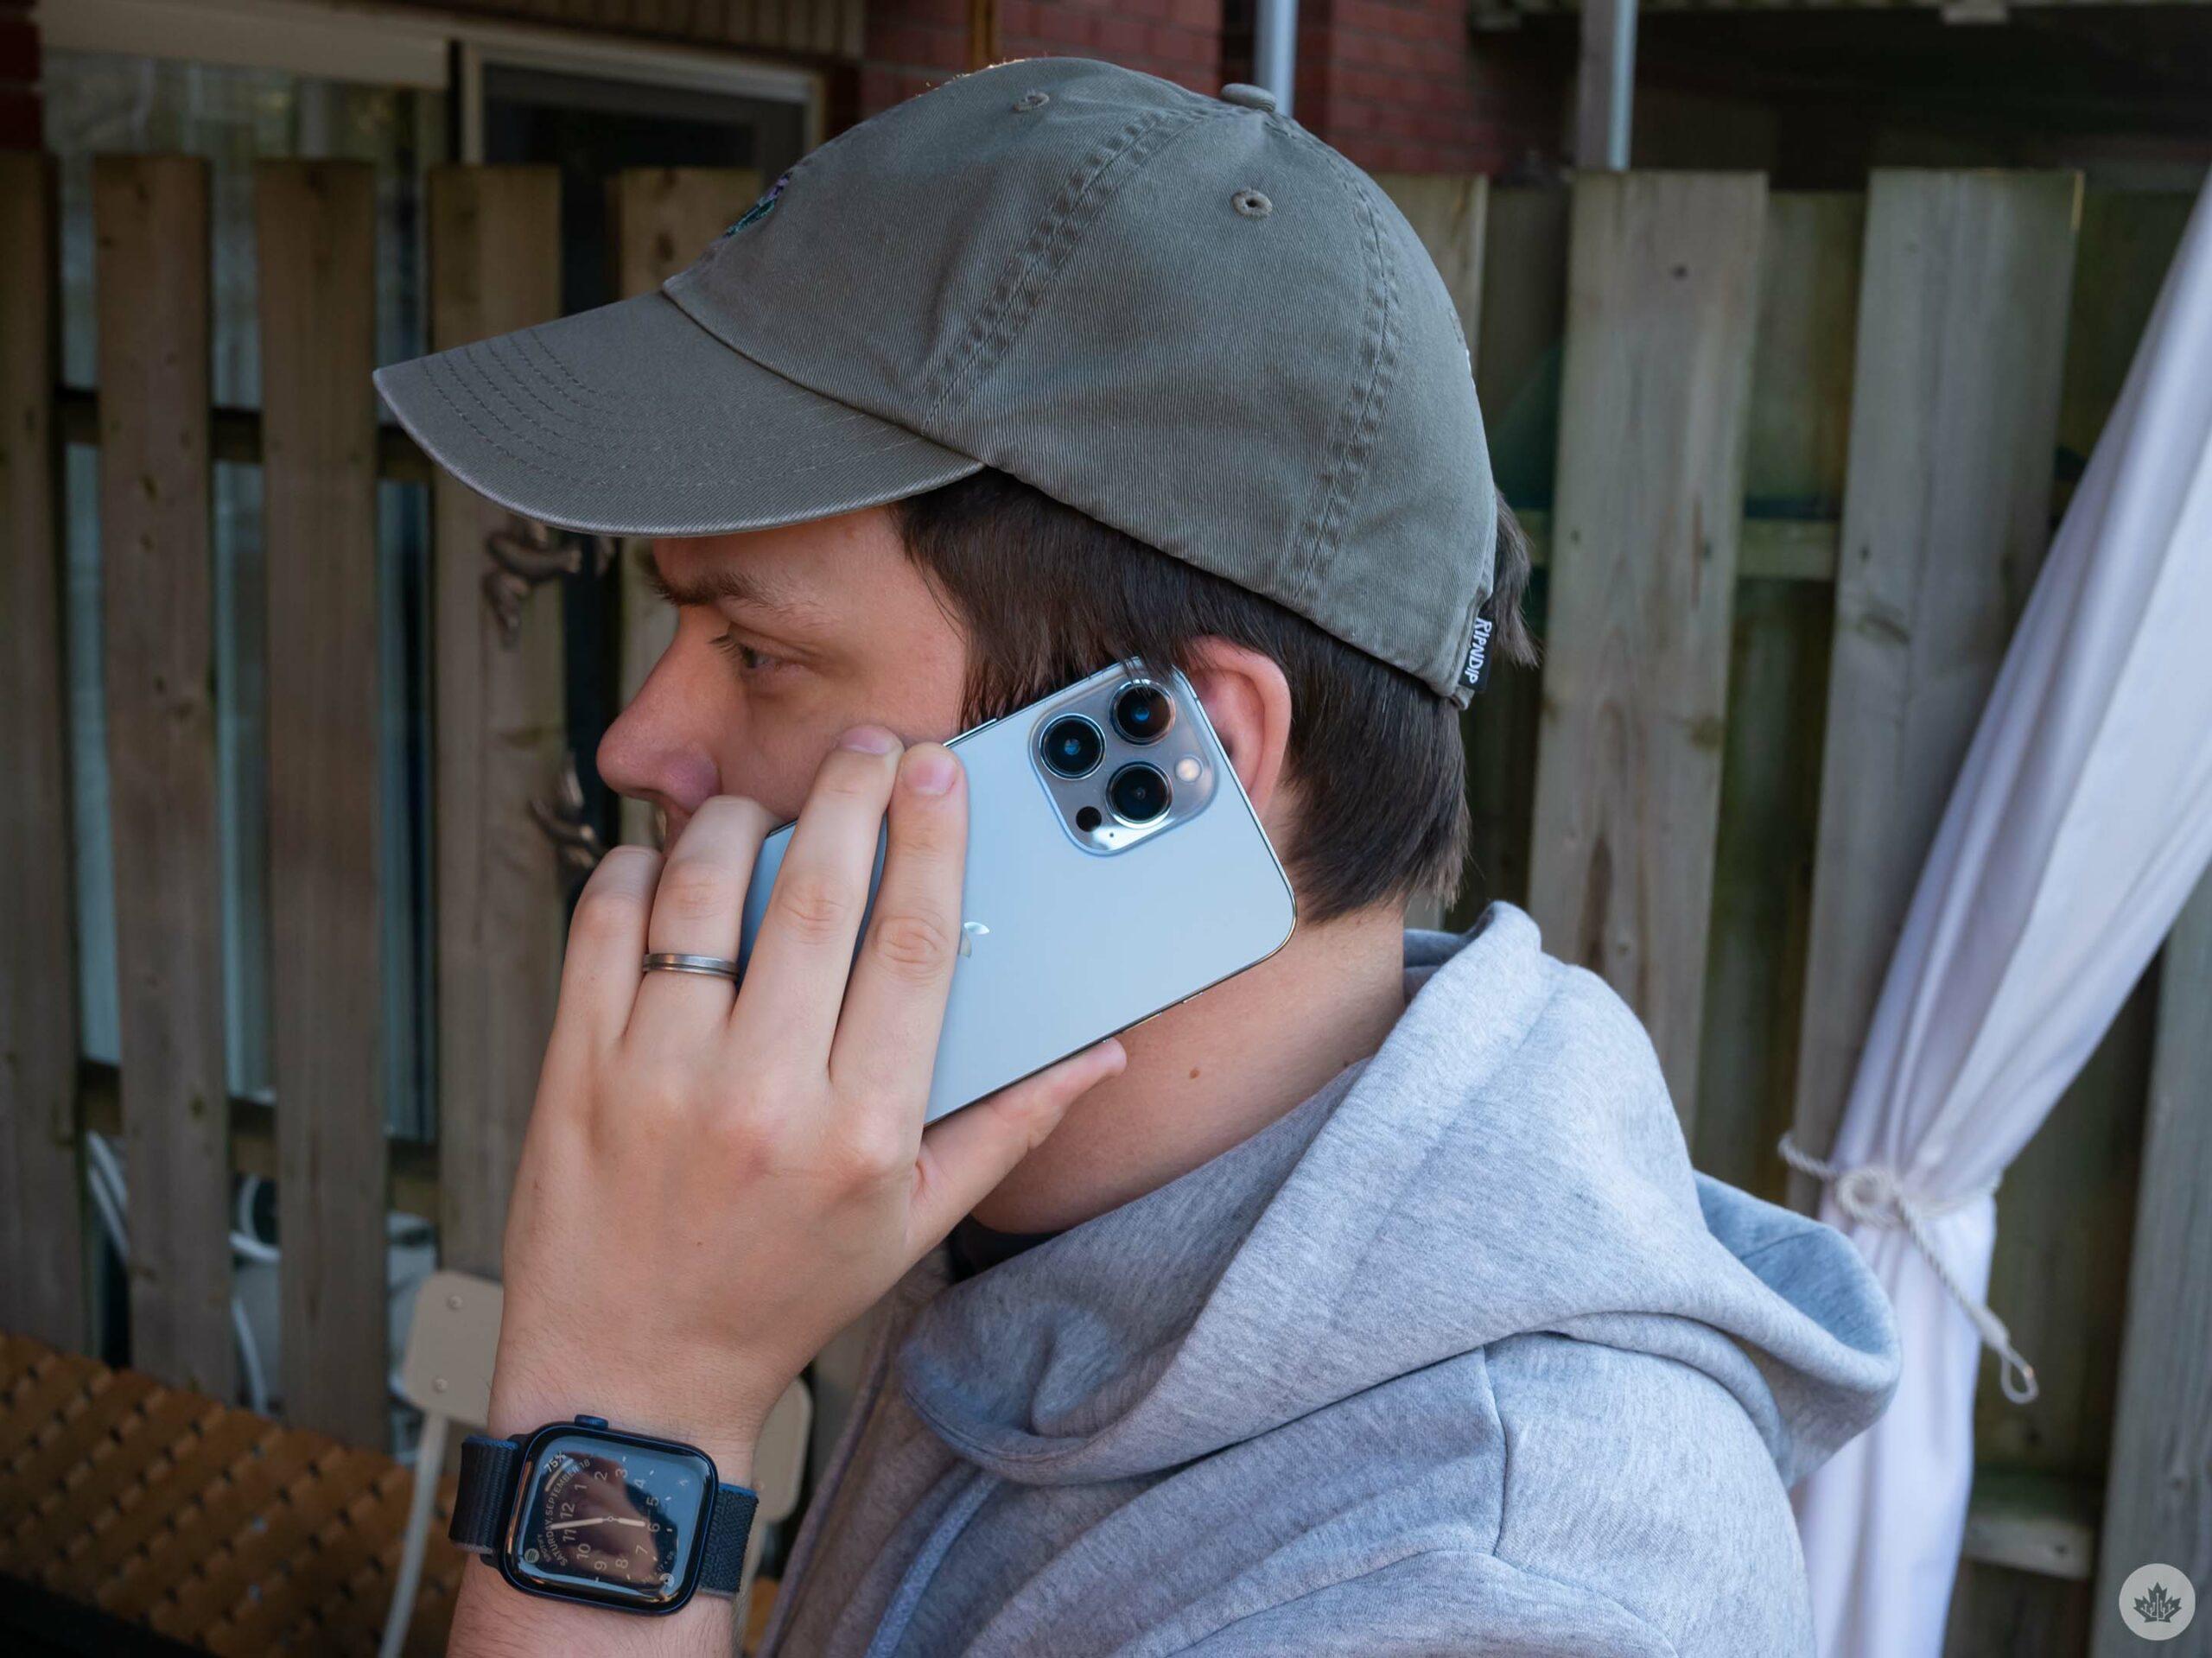 iPhone 13 Pro Max phone call